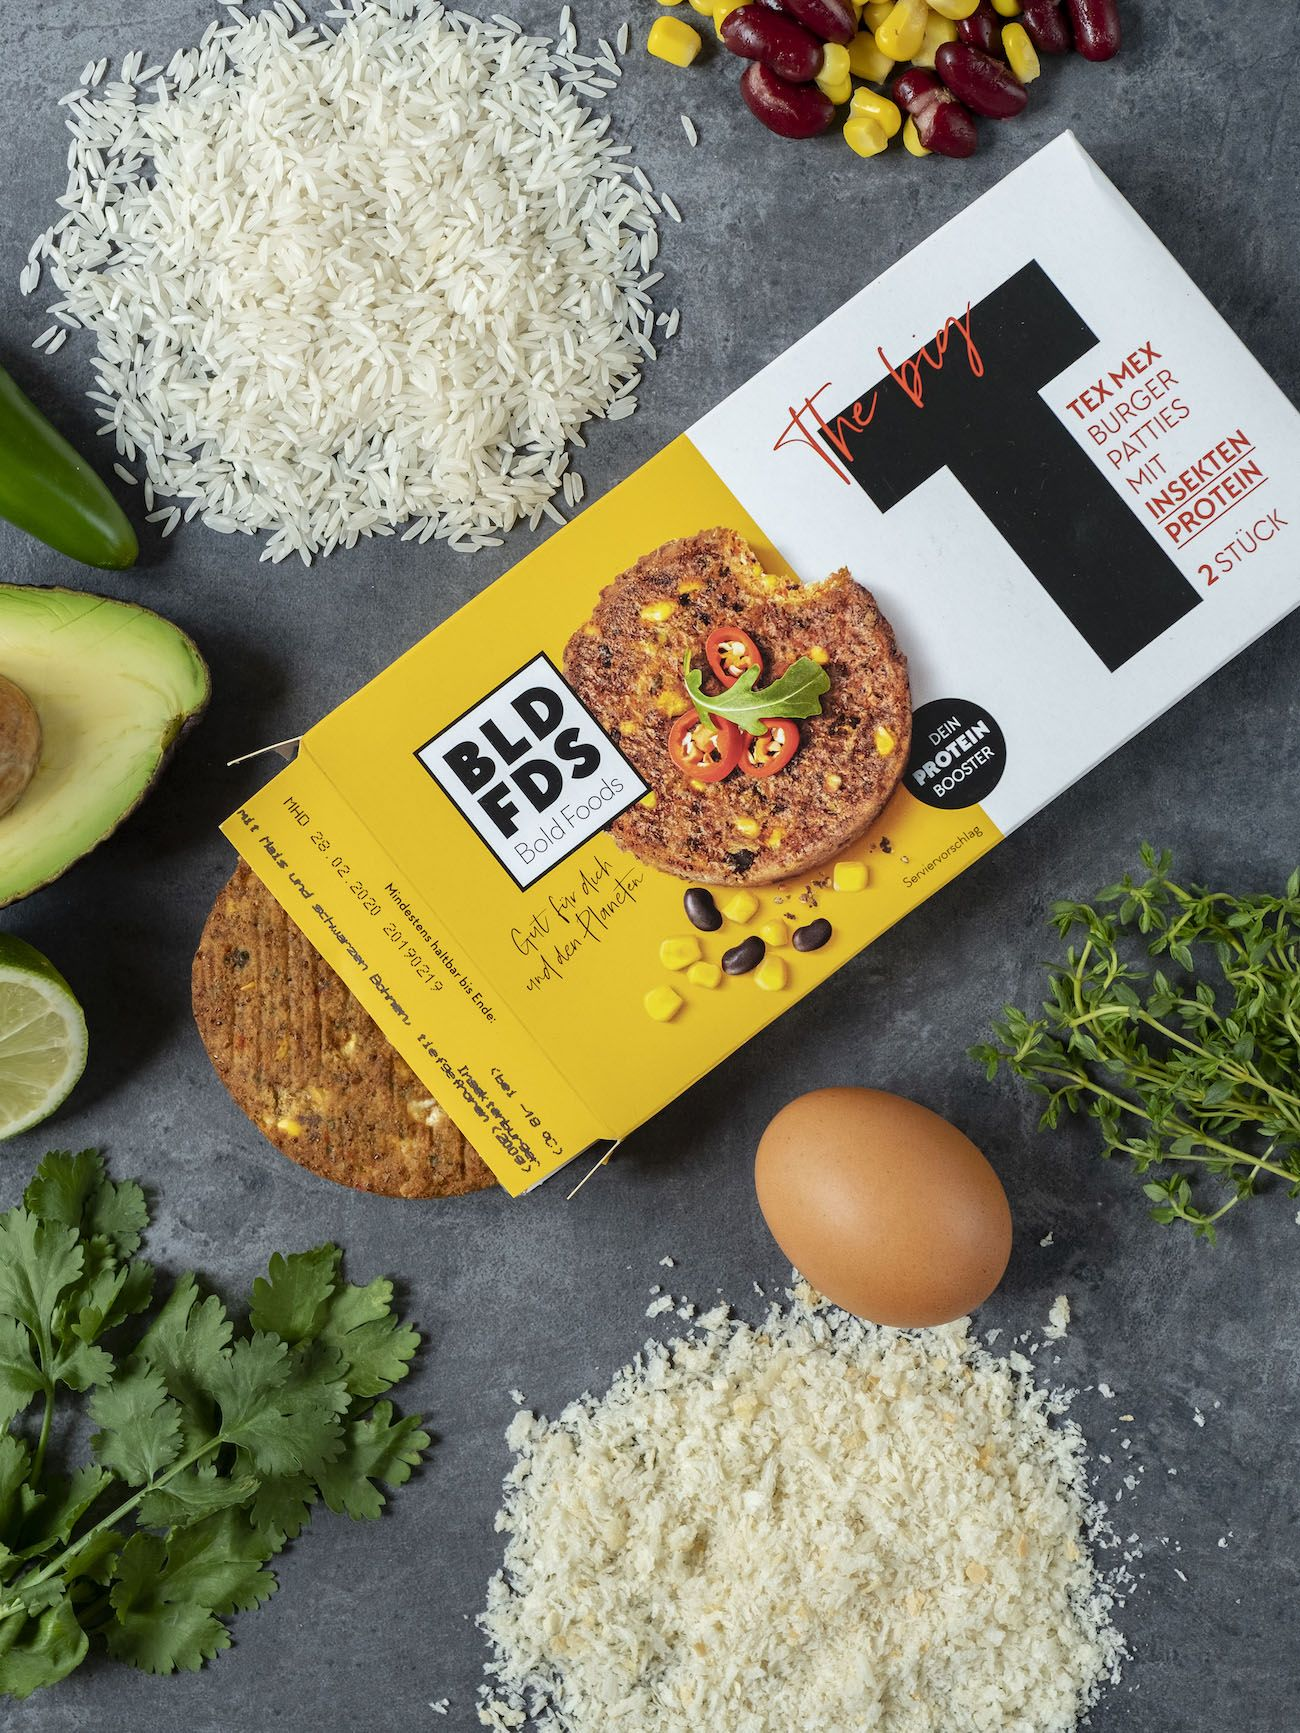 About Fuel, Foodblog, Bold Foods, Rezept, The Big T Schnitzel mit Reis und Avocadocreme, Panko